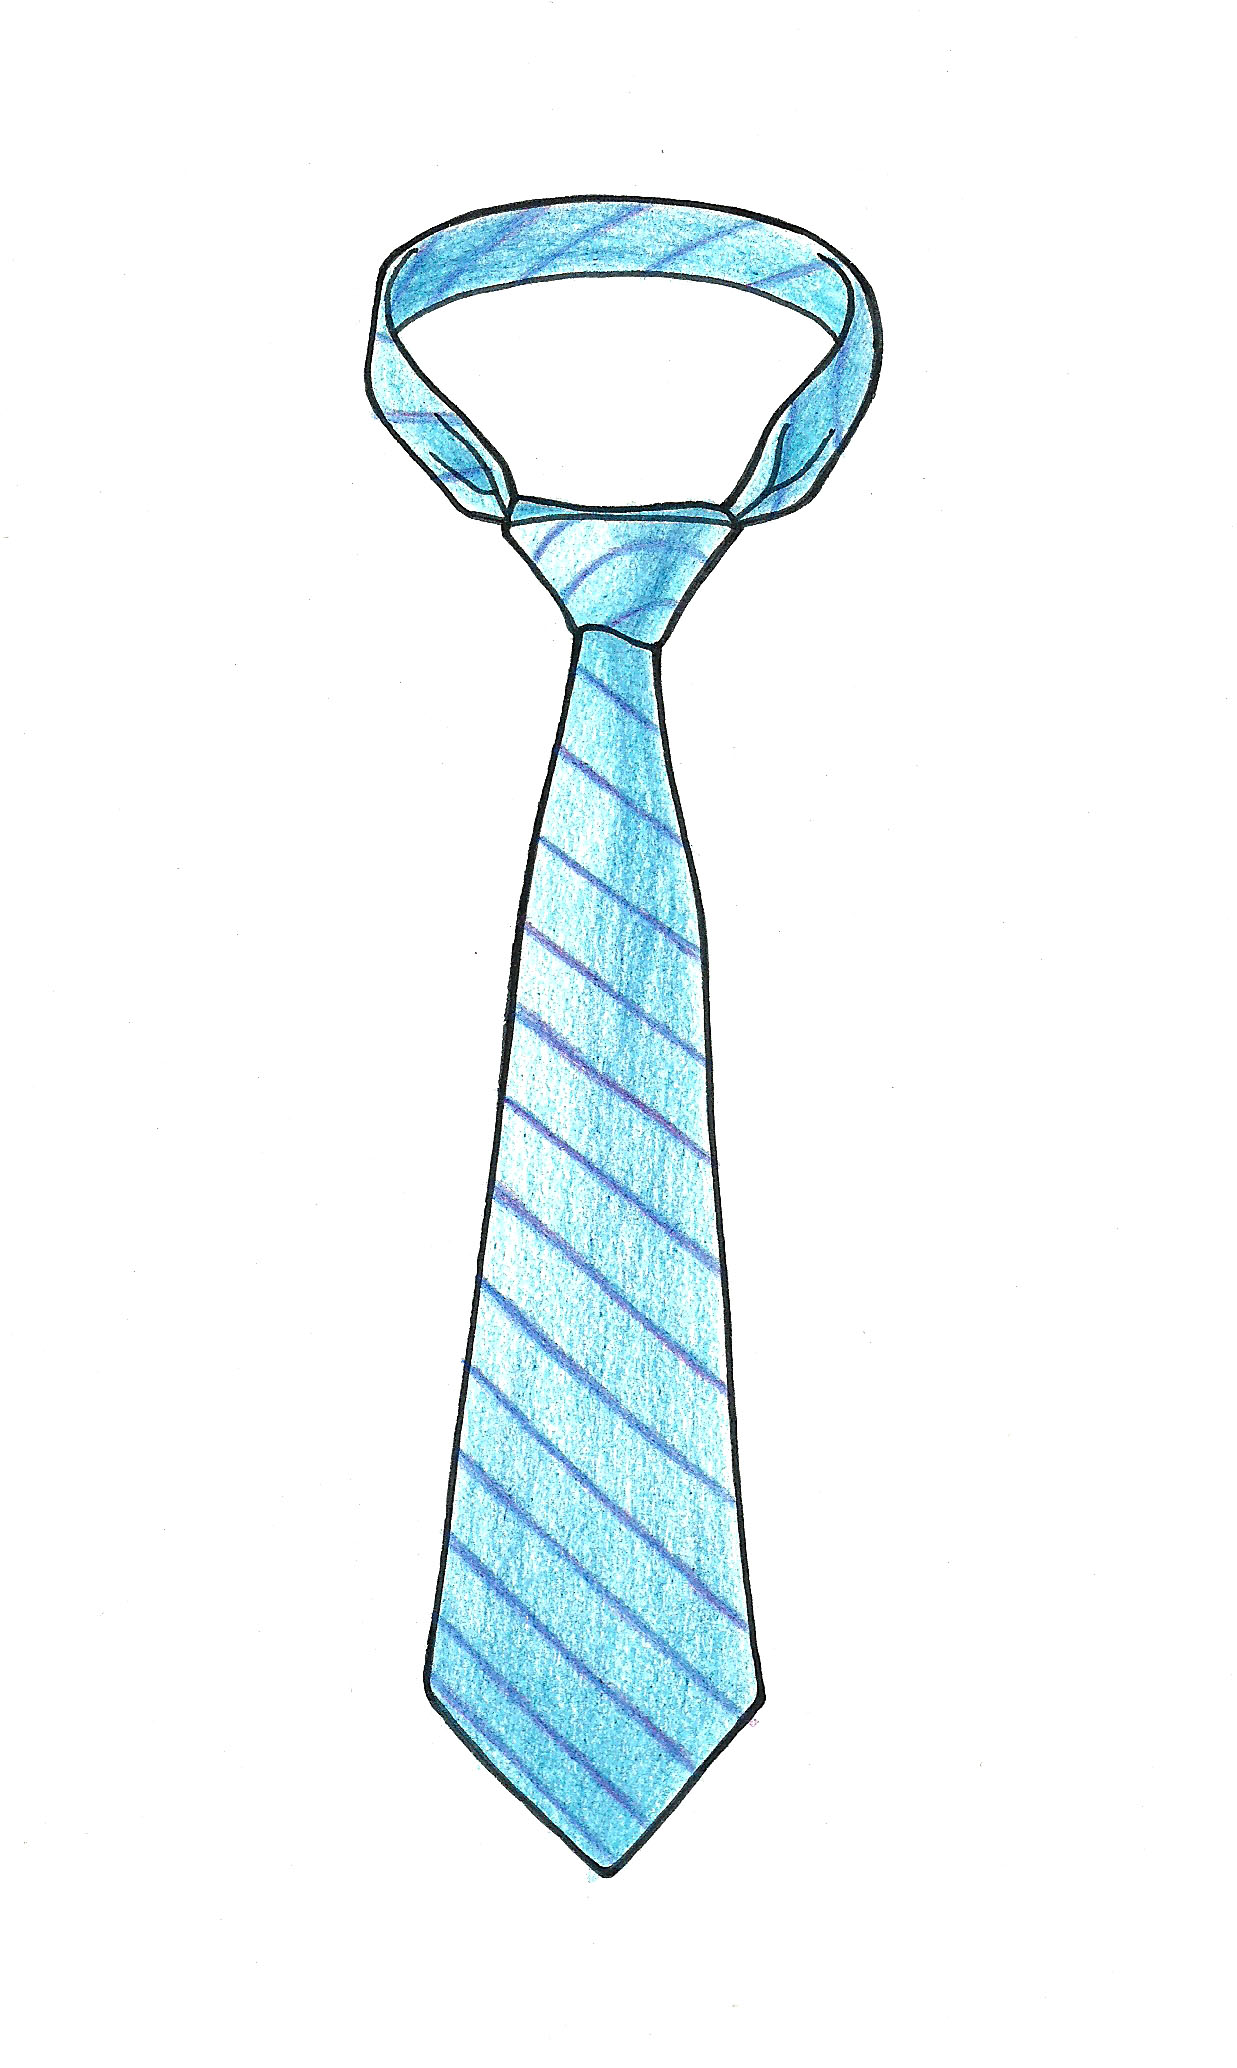 1237x2068 15 It Tie, Opinions On Tie Draw